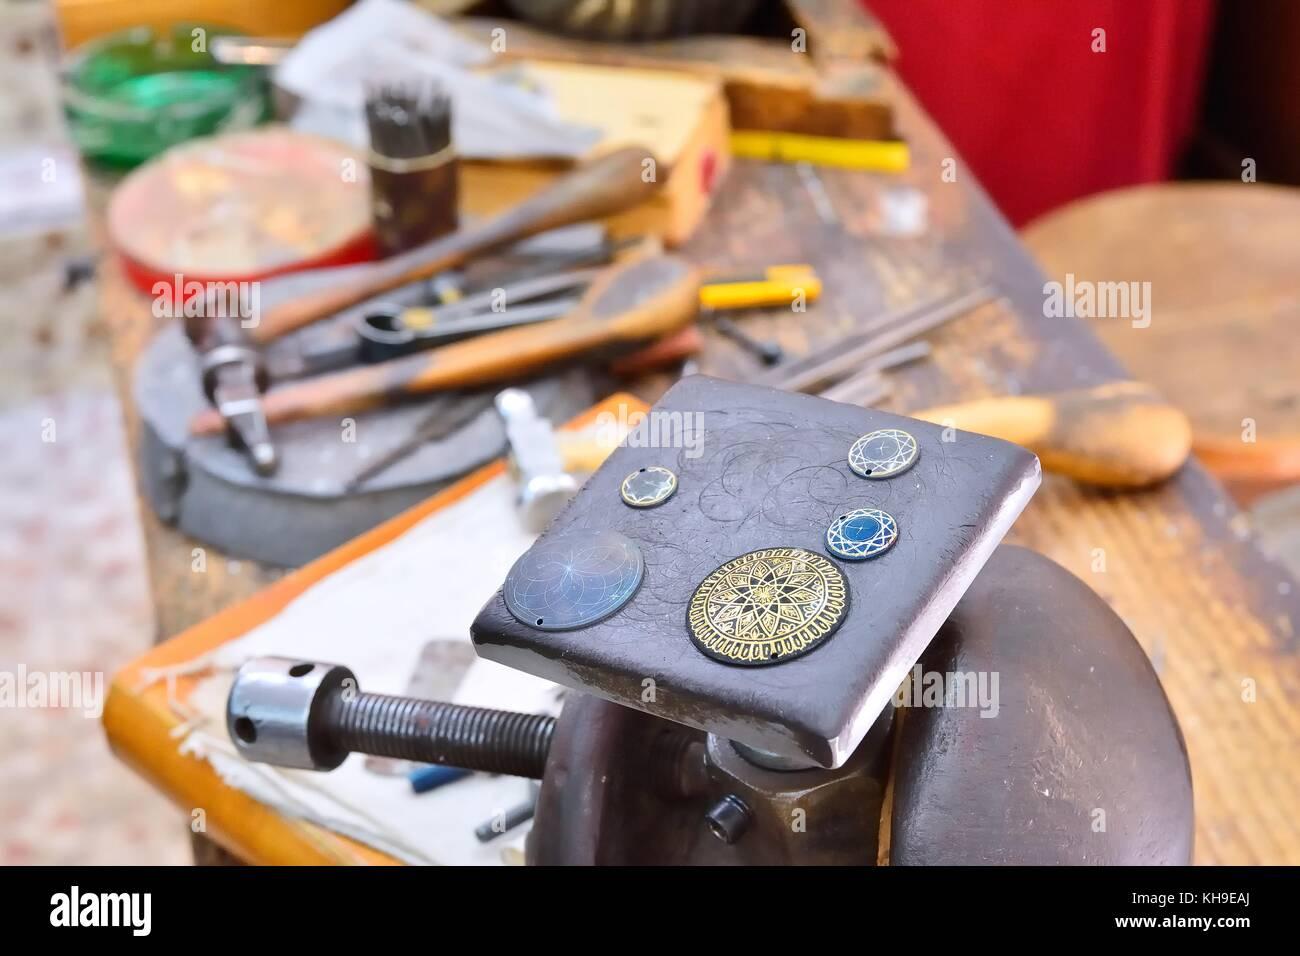 Damascene work craftsman workshop in Toledo, Spain. - Stock Image